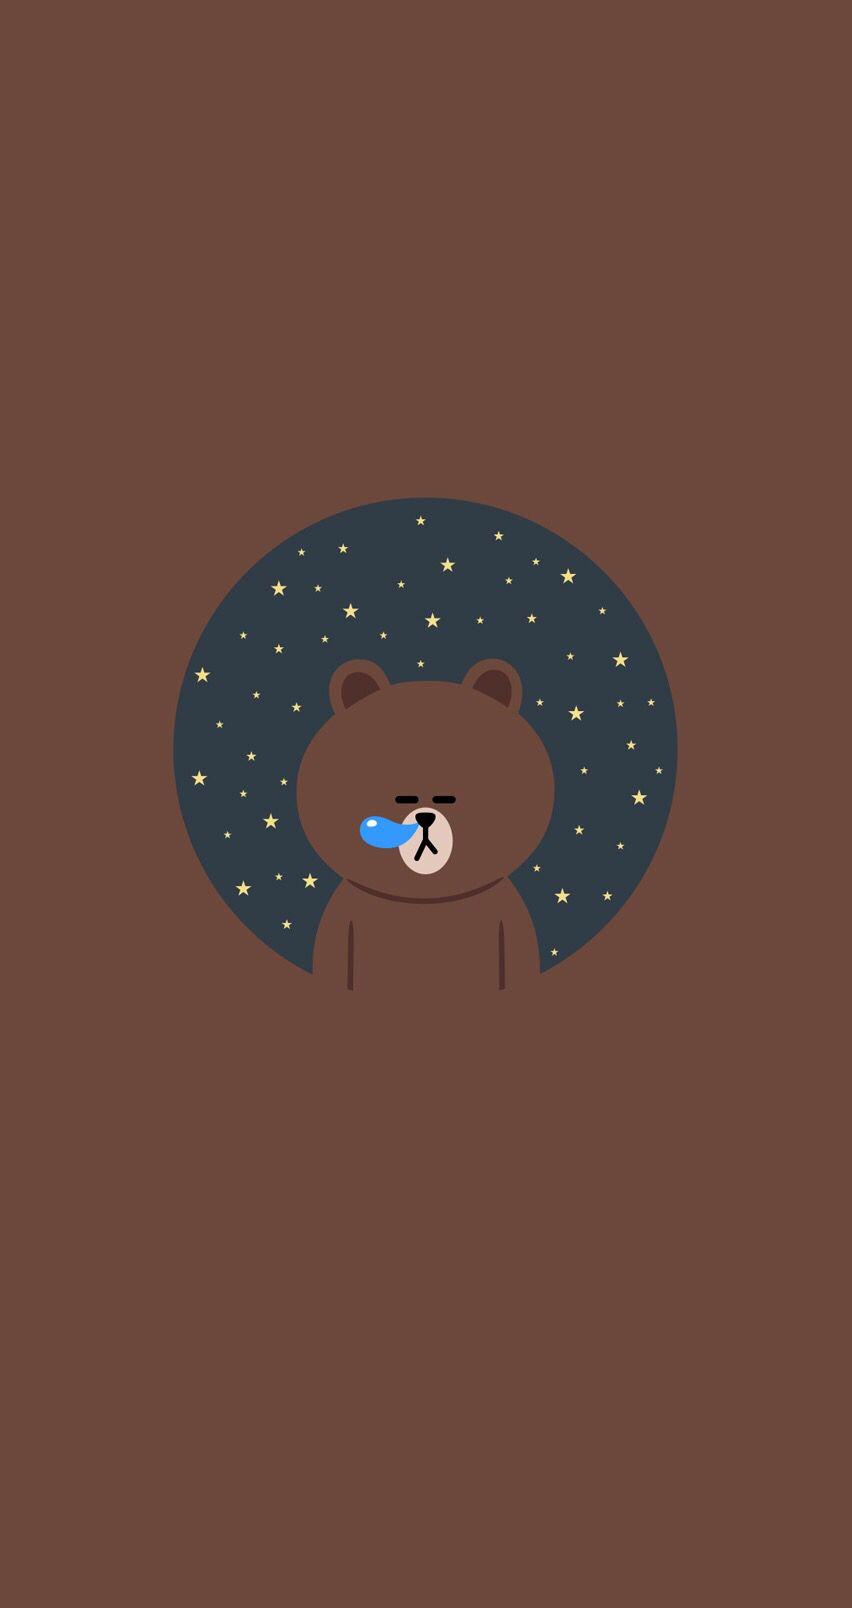 Cute Rilakkuma Bear Wallpaper Wallpaper Line Friends(≧ ≦) Wallpaper Doodle Cute